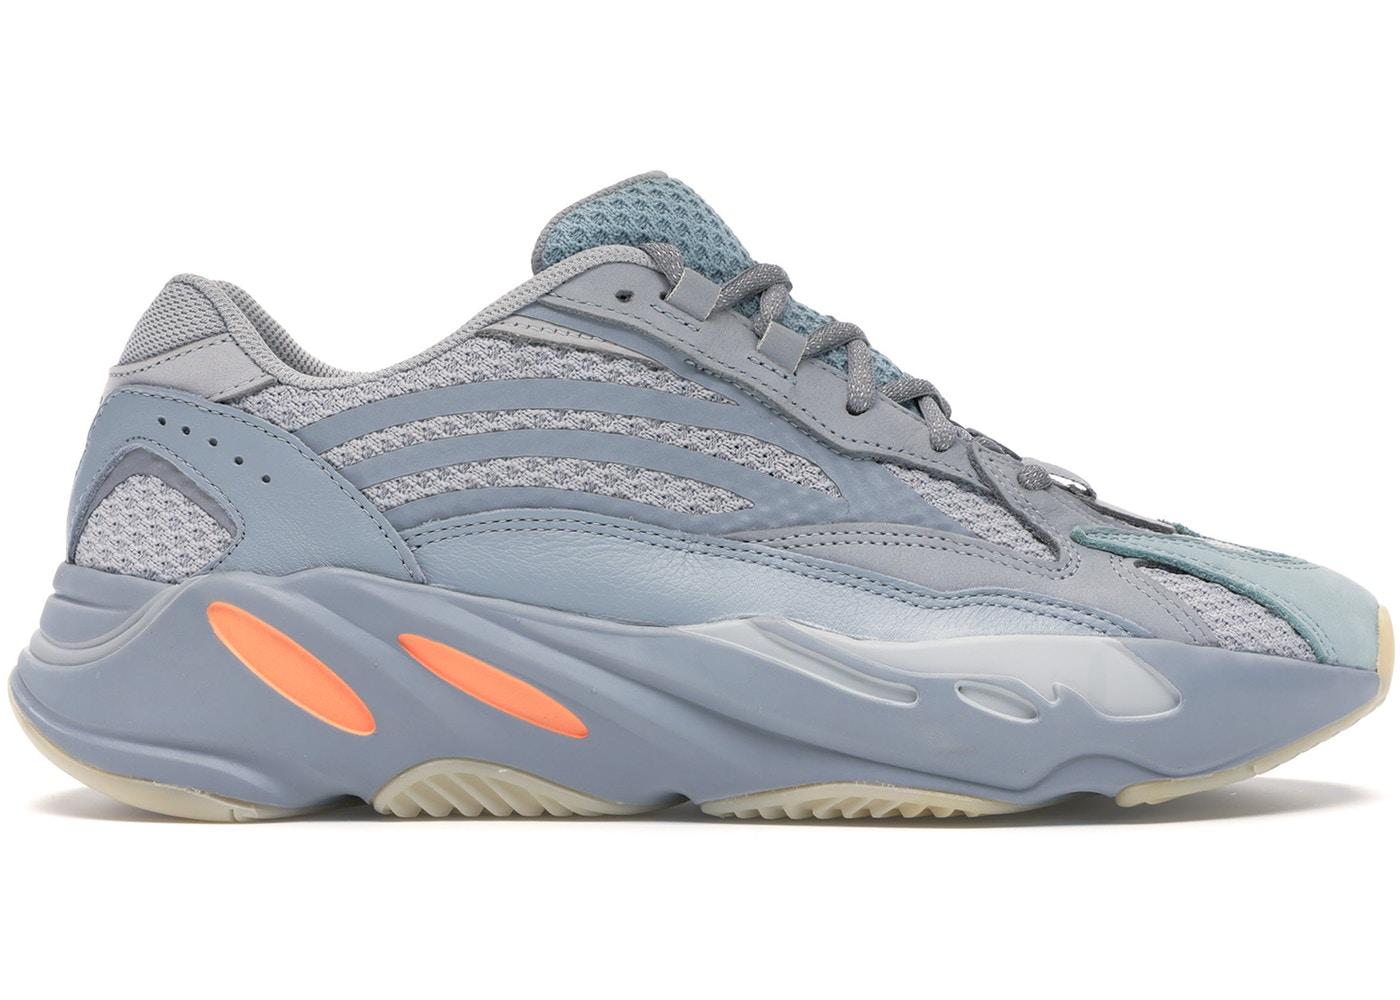 Restock: adidas Yeezy Boost 700 V2